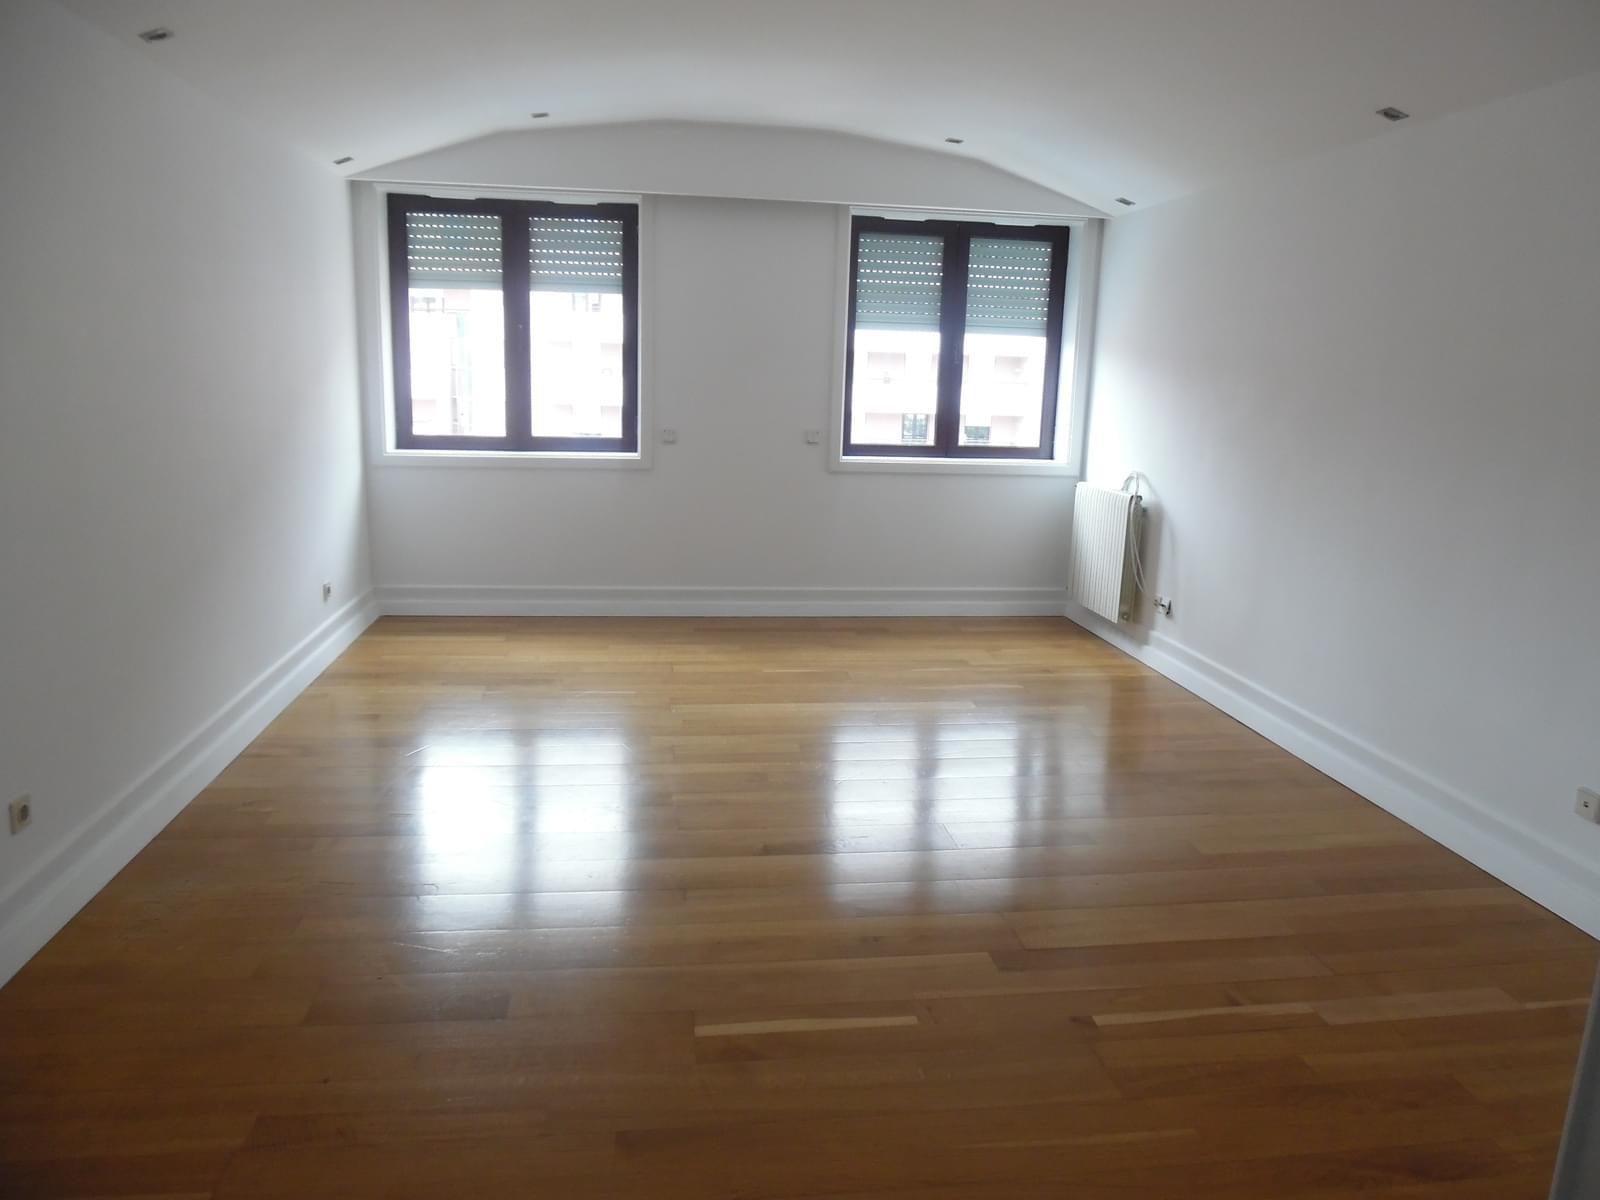 pf17637-apartamento-t2-lisboa-23ae405f-a66a-4d1e-9ff7-e4fab7dc2398